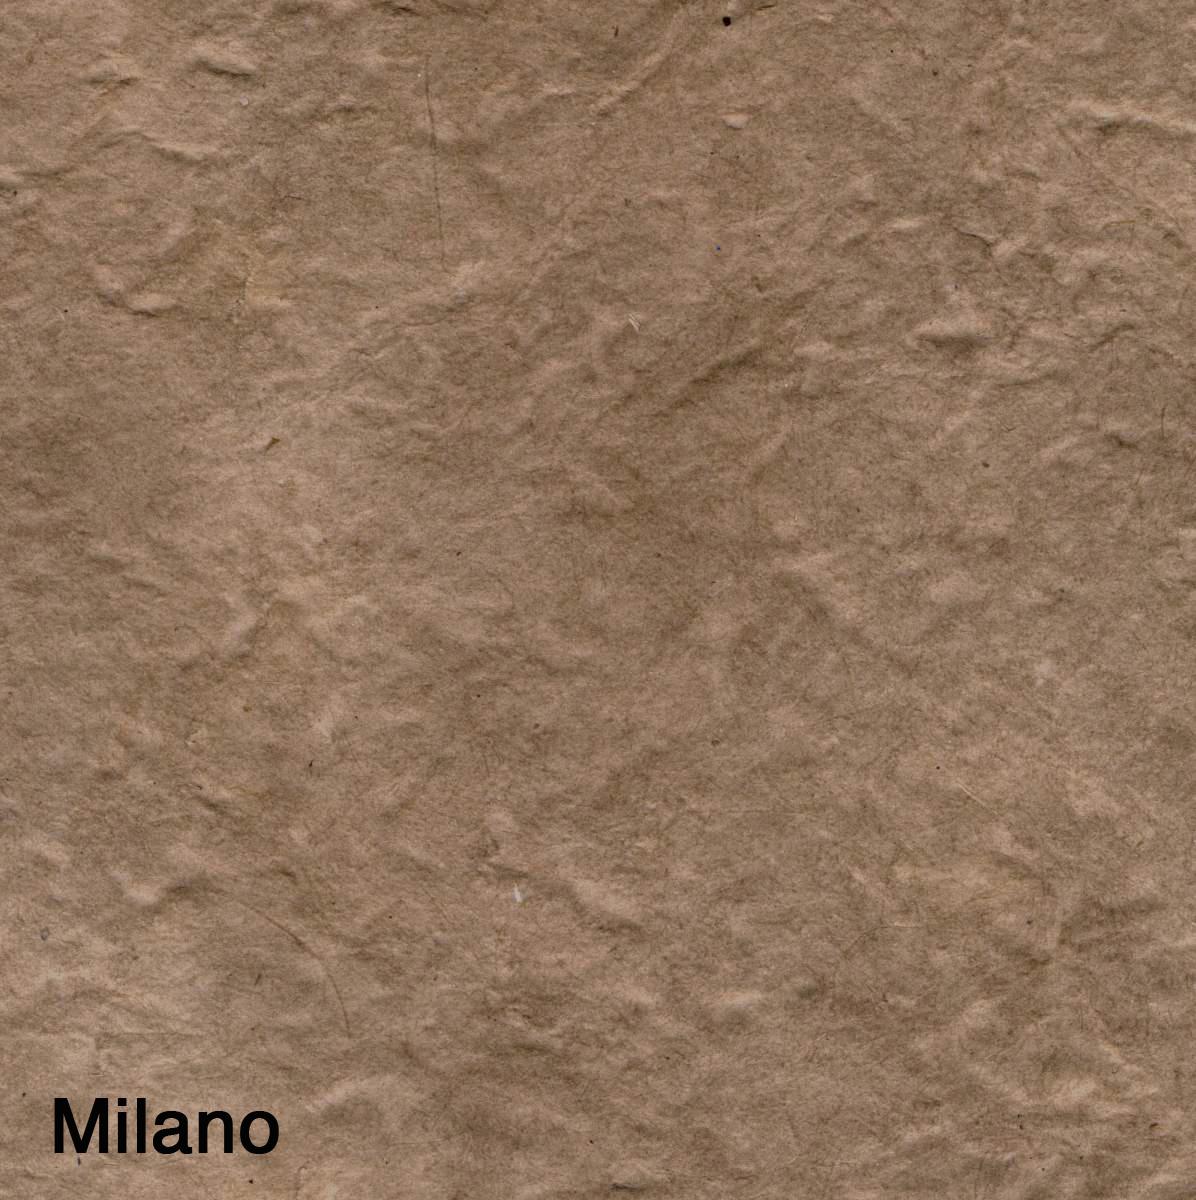 Milano004.jpg